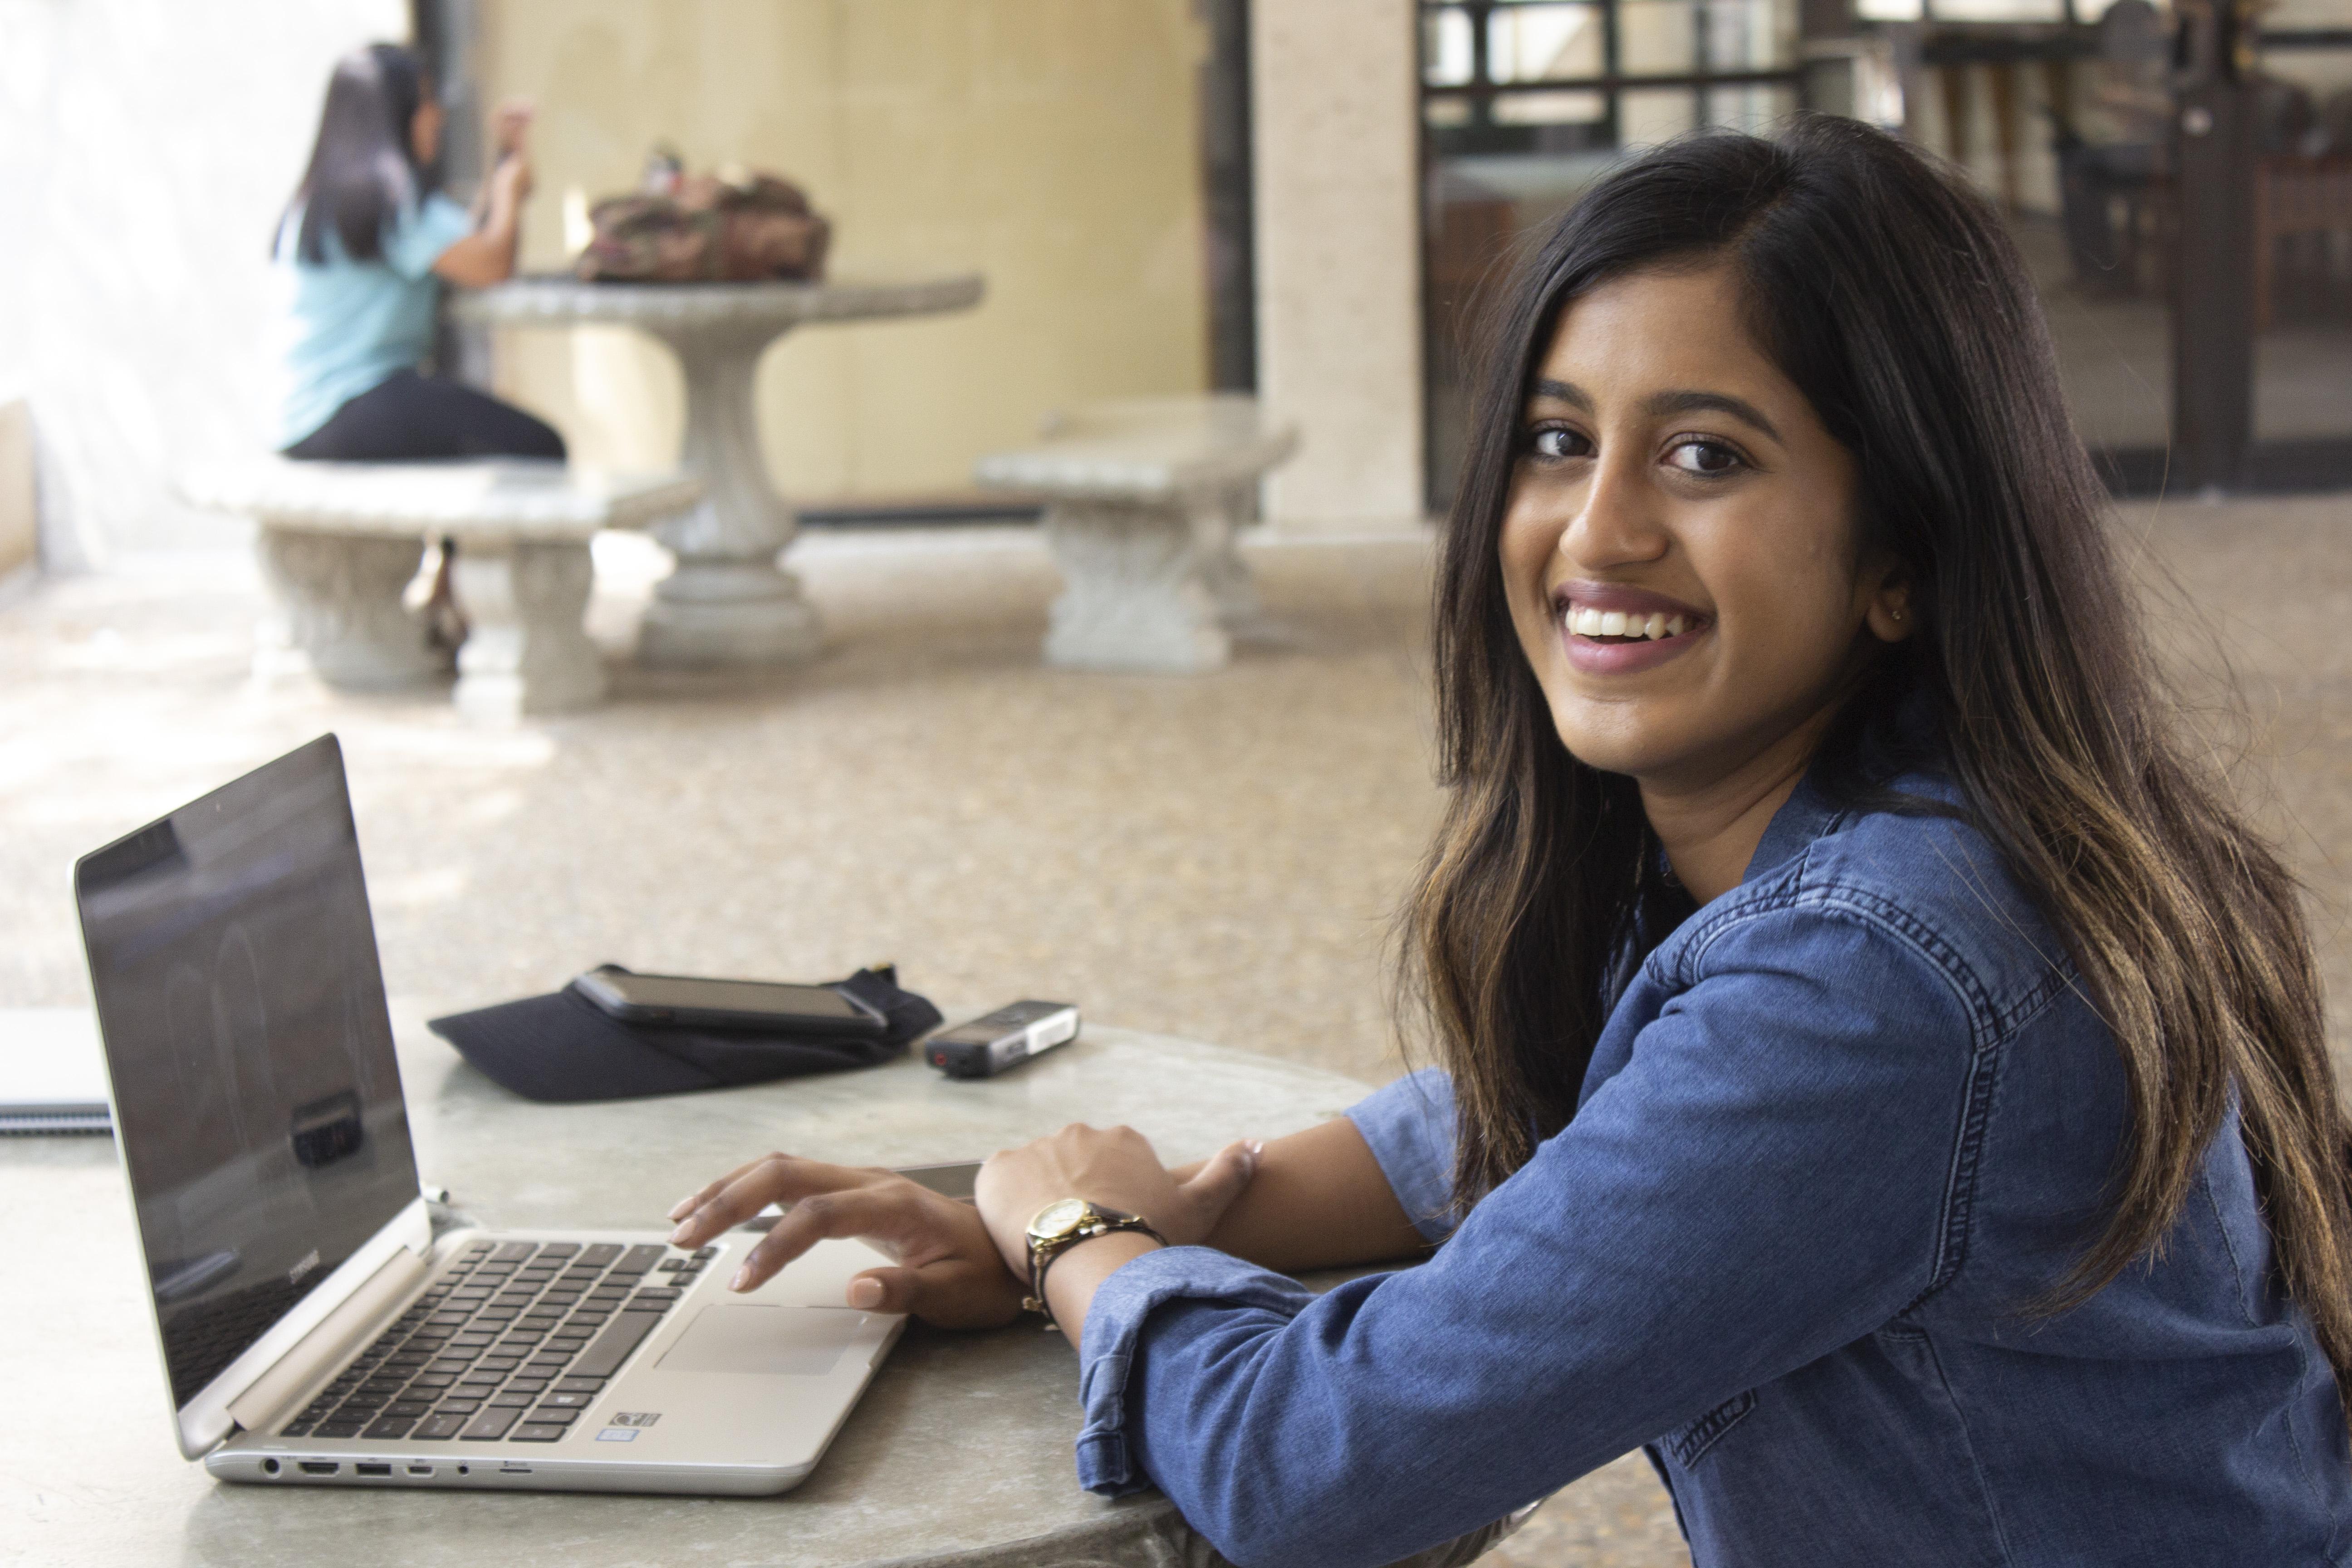 Student sees hobby in new lens